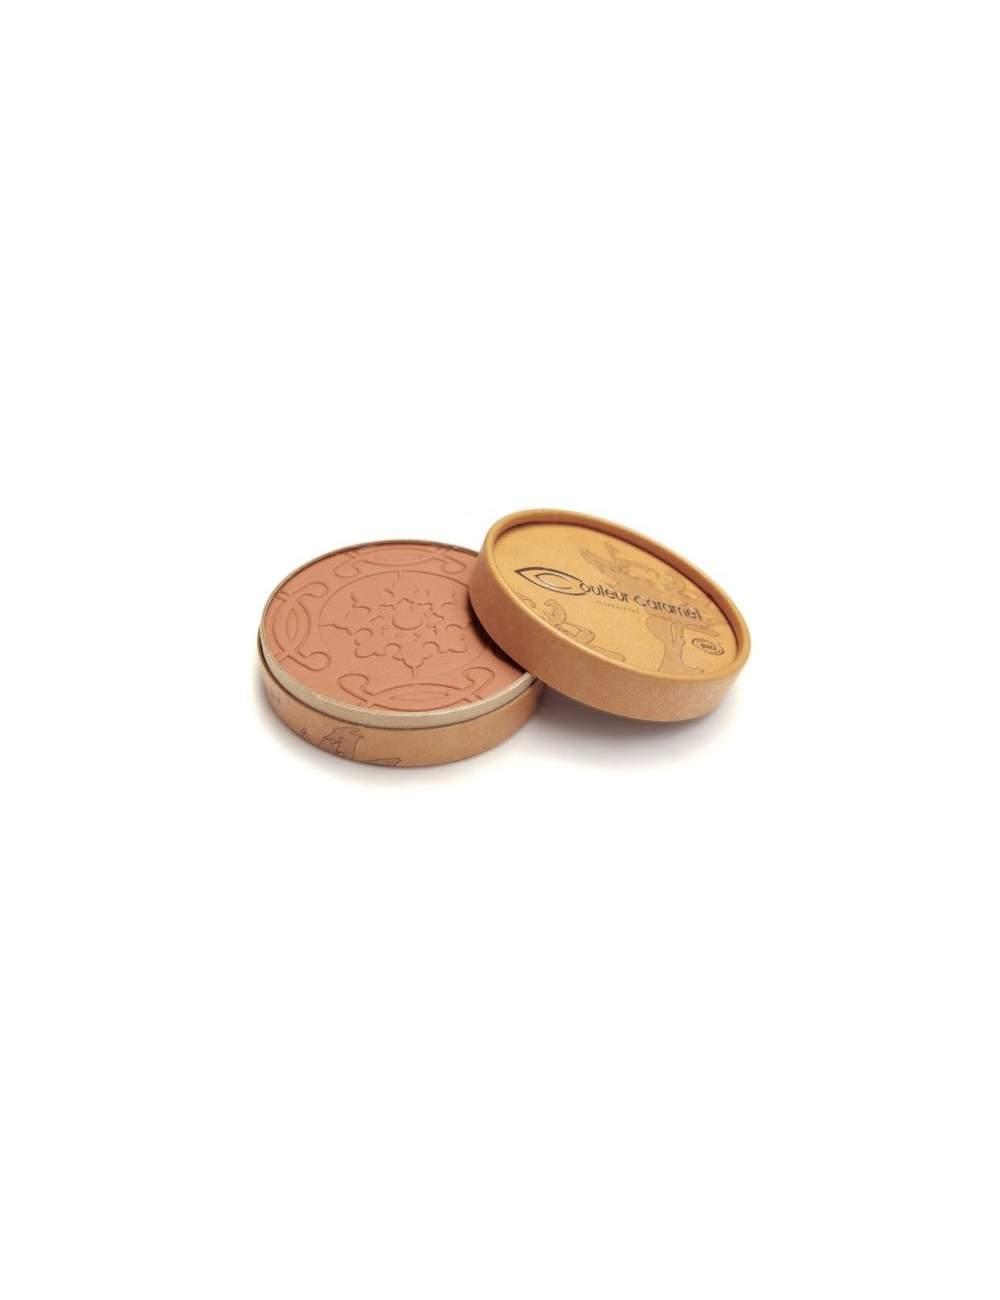 Polvos Bronceadores Bio Mate Terre Caramel 27 Orange Brown. Couleur Caramel